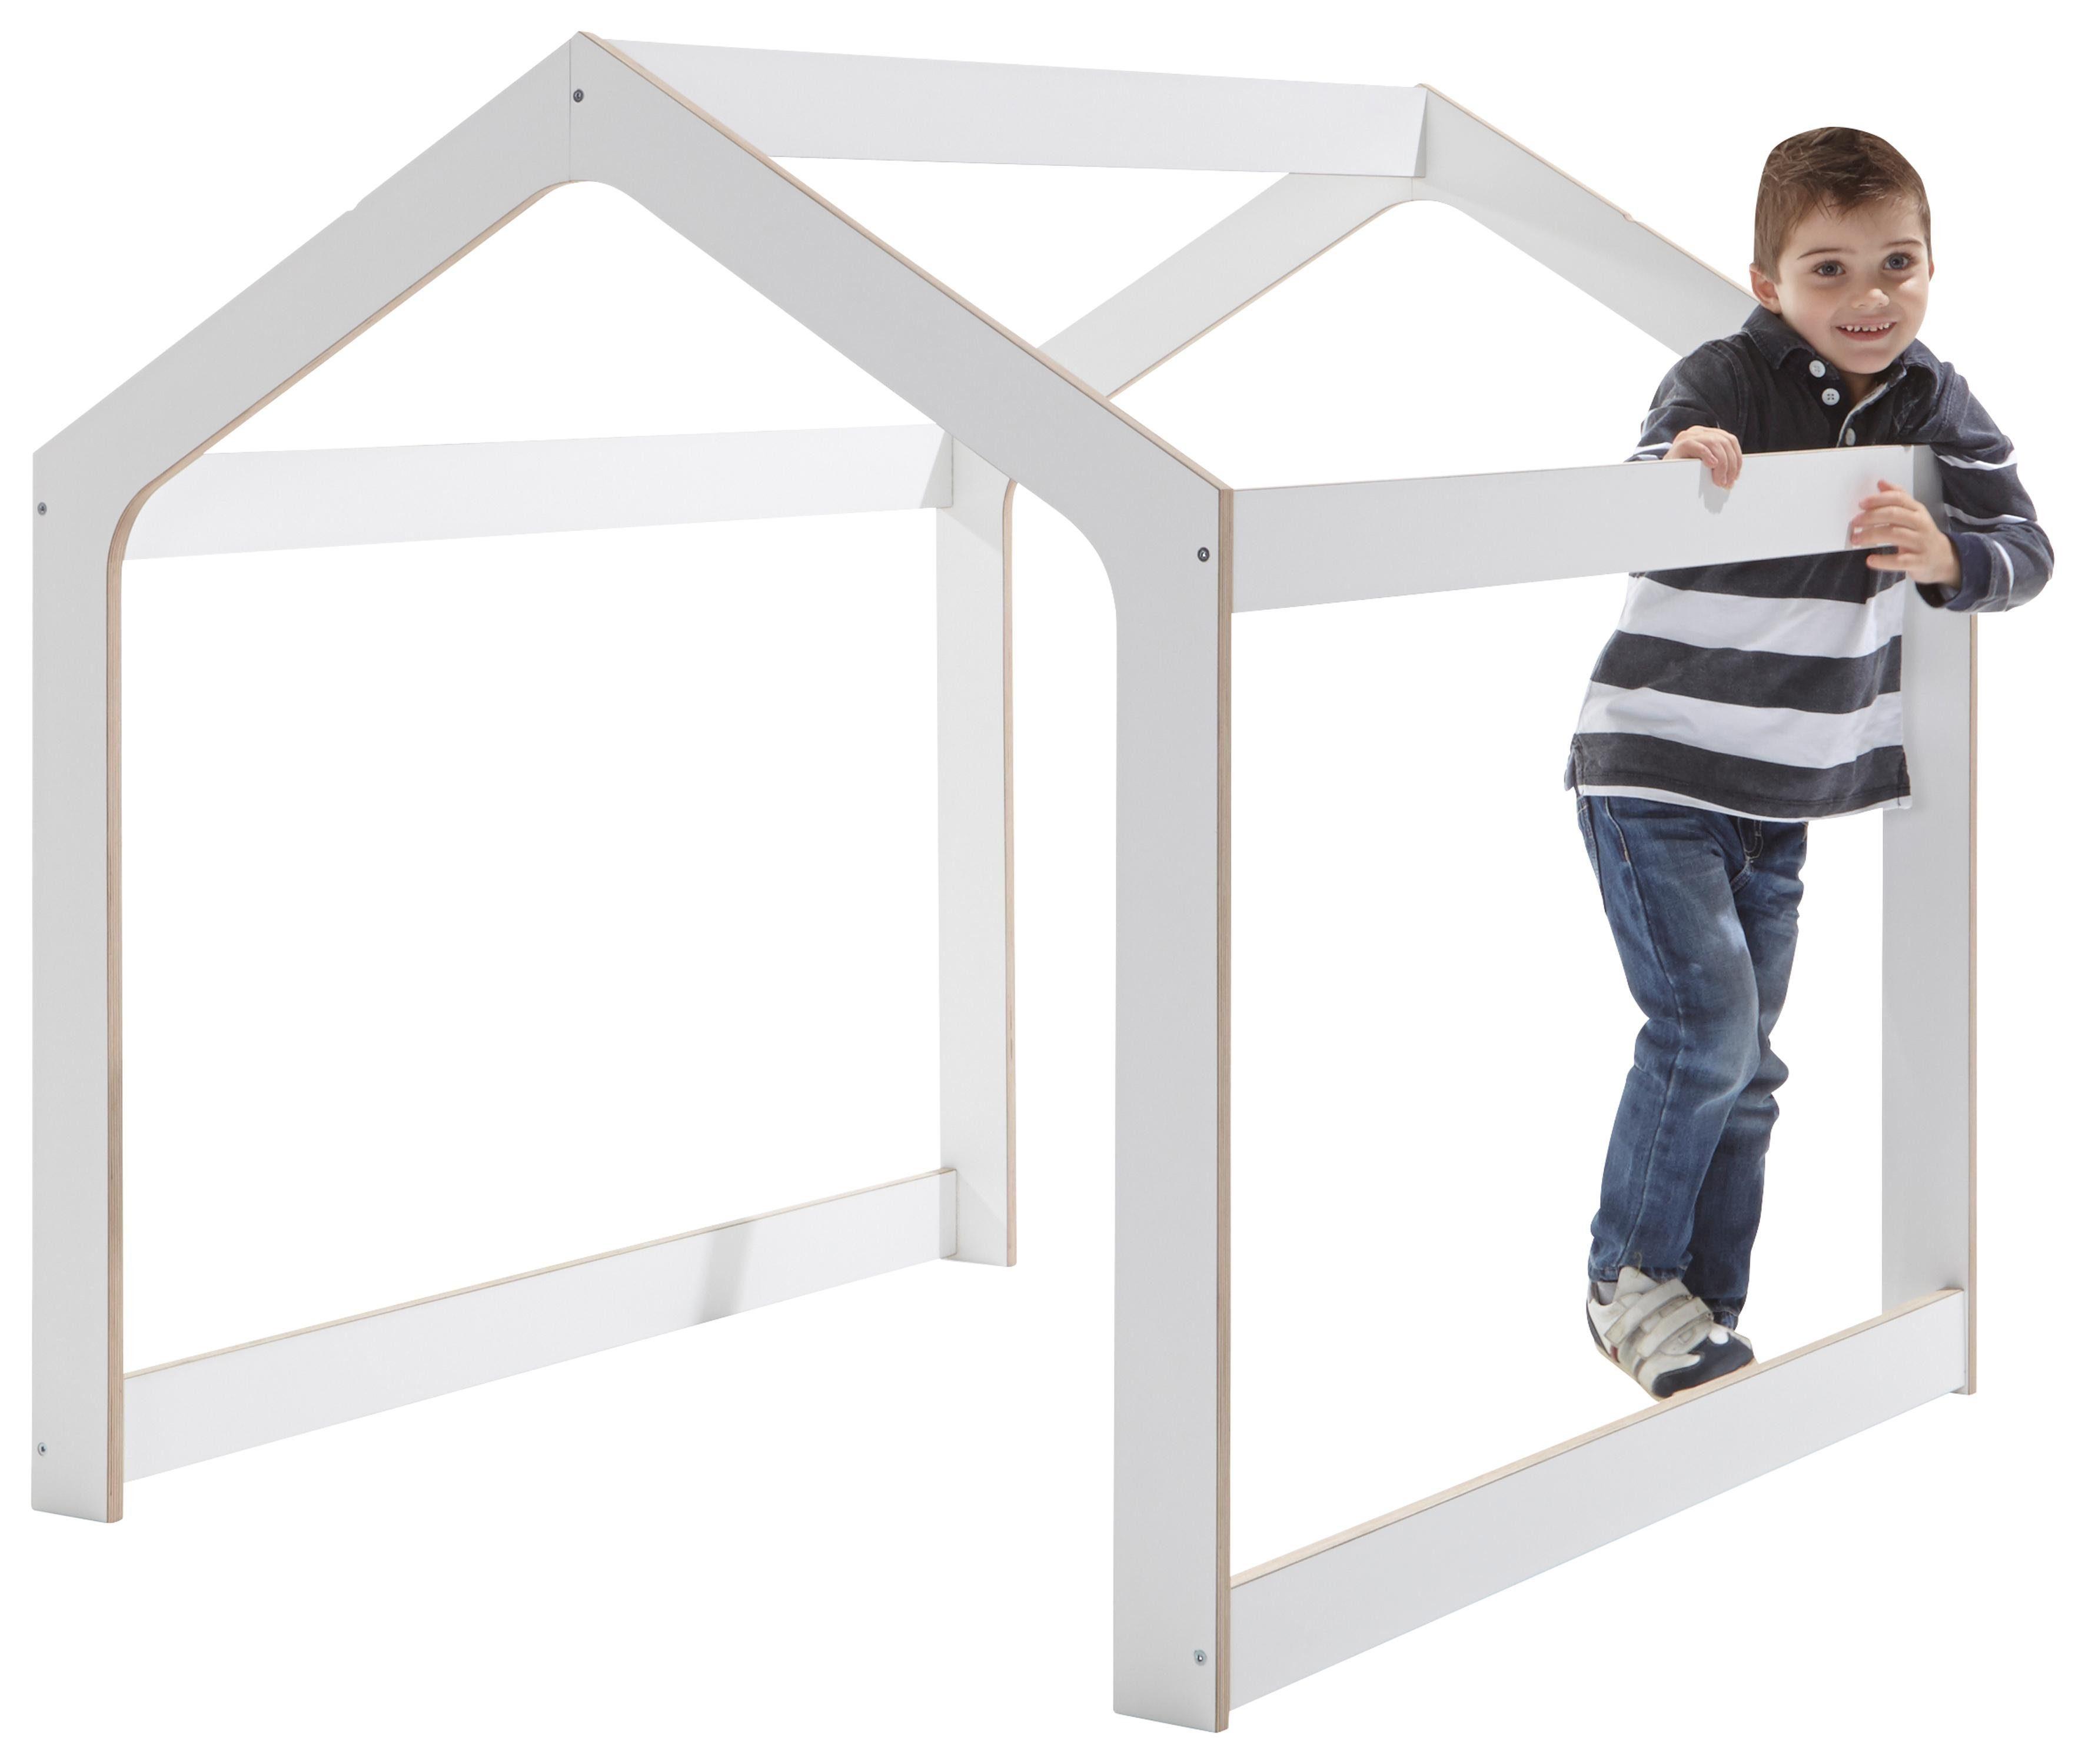 müller möbelwerkstätten® Kinderspielhaus »PLAYHOUSE« aus hochwertigem Birkenschichtholz